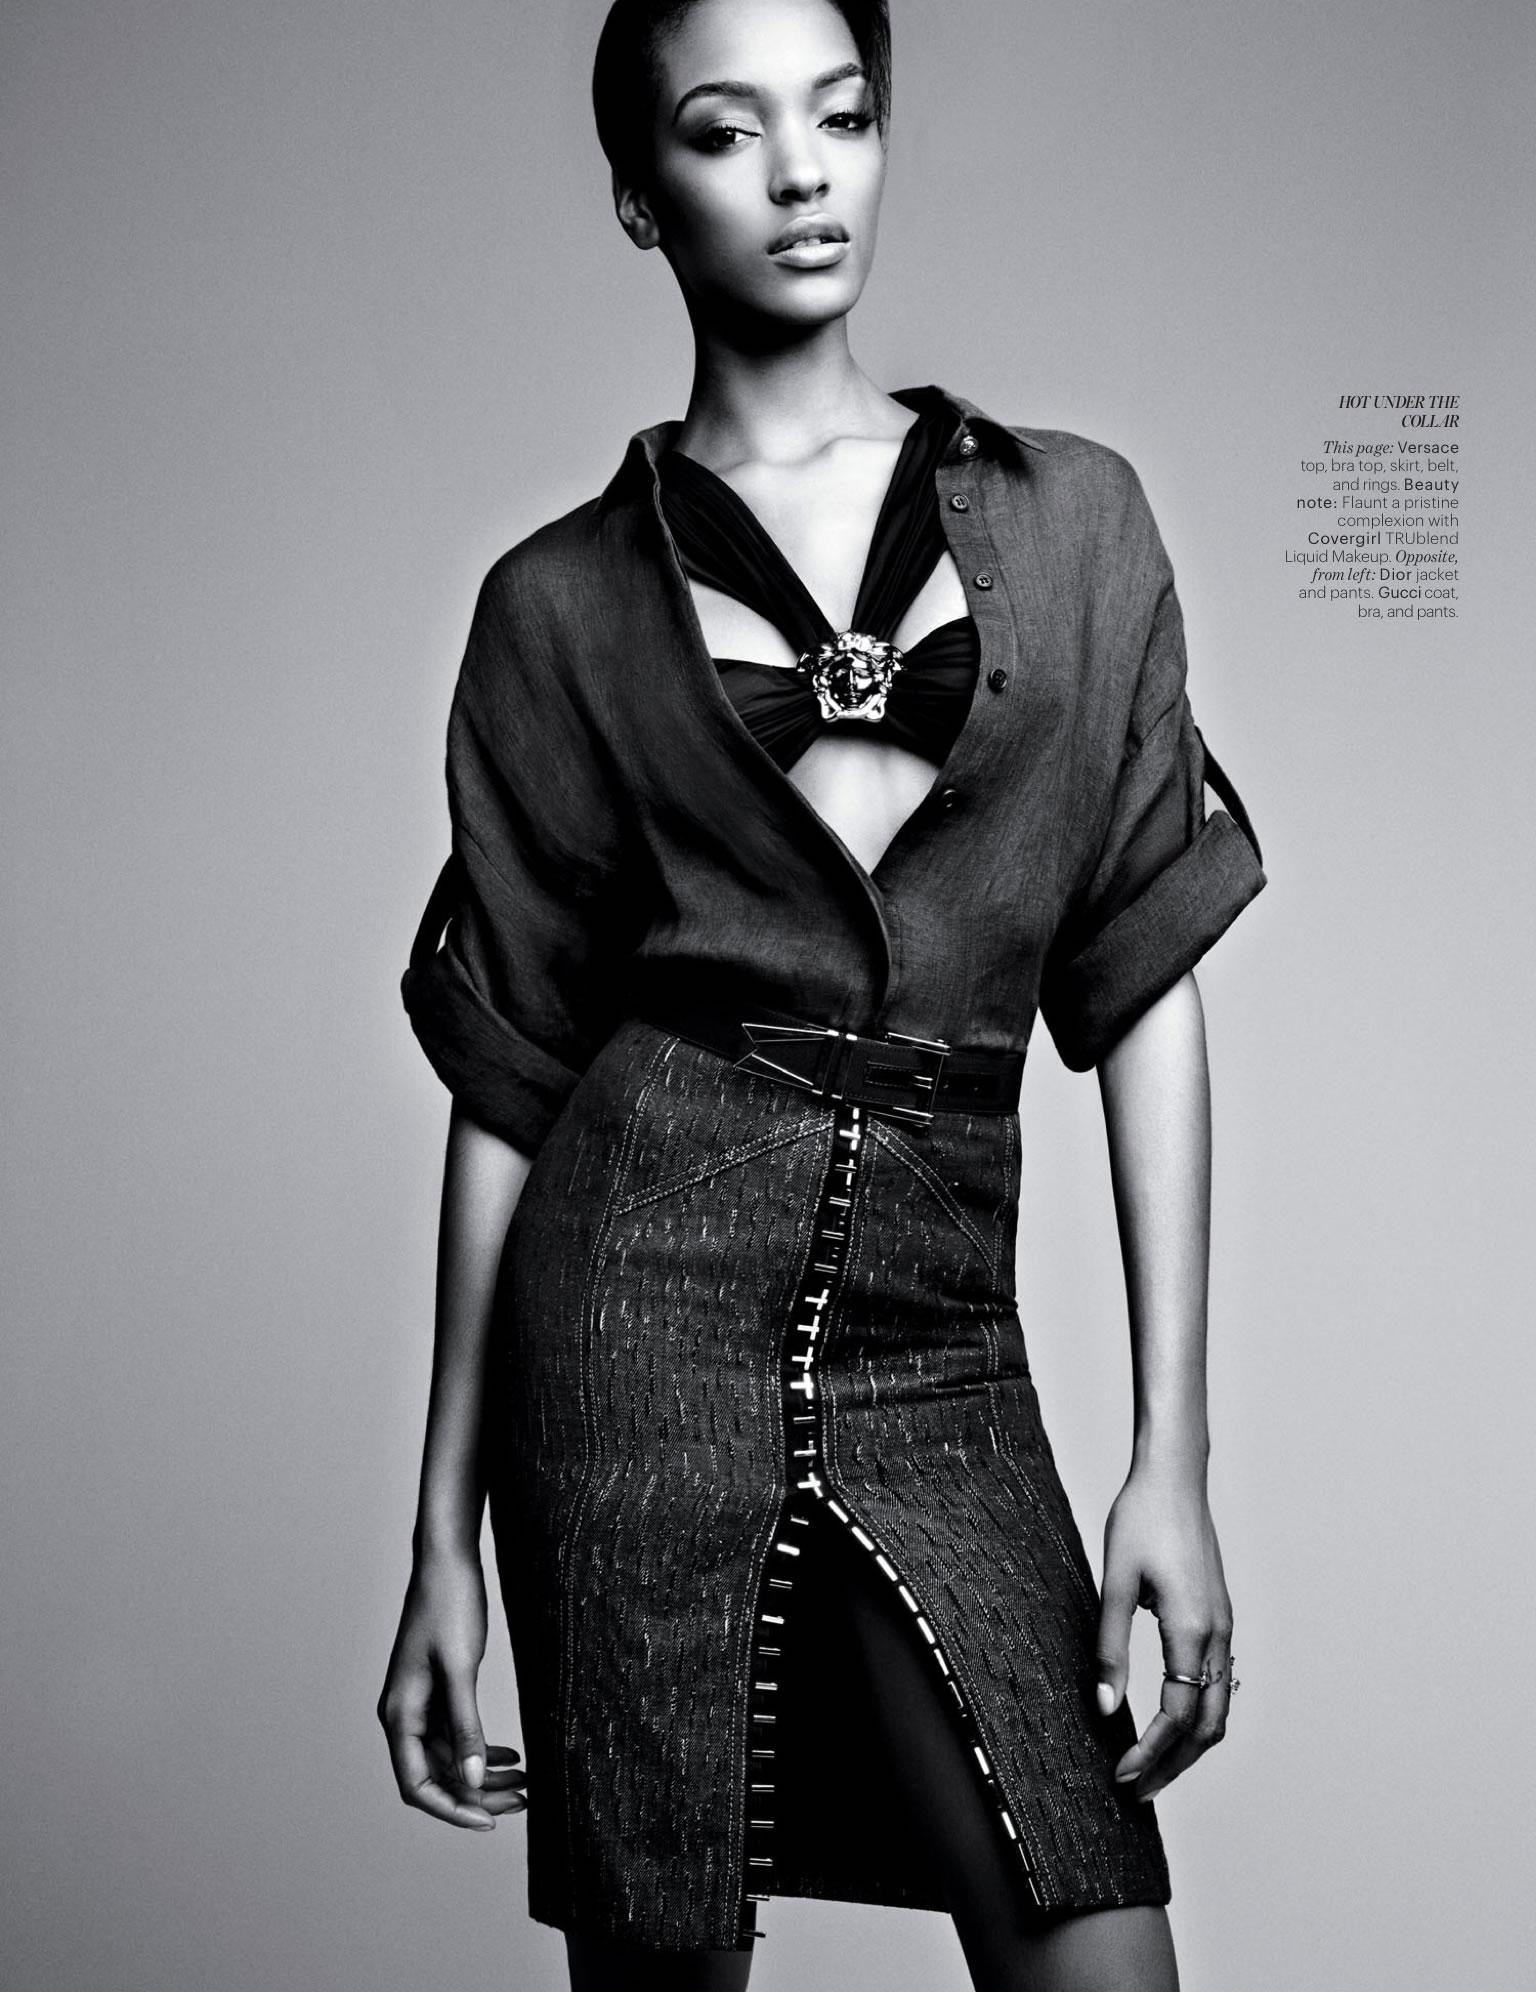 Wallpaper Jourdan Dunn Top Fashion Models 2015 Model: Jourdan Dunn Photo 238 Of 299 Pics, Wallpaper